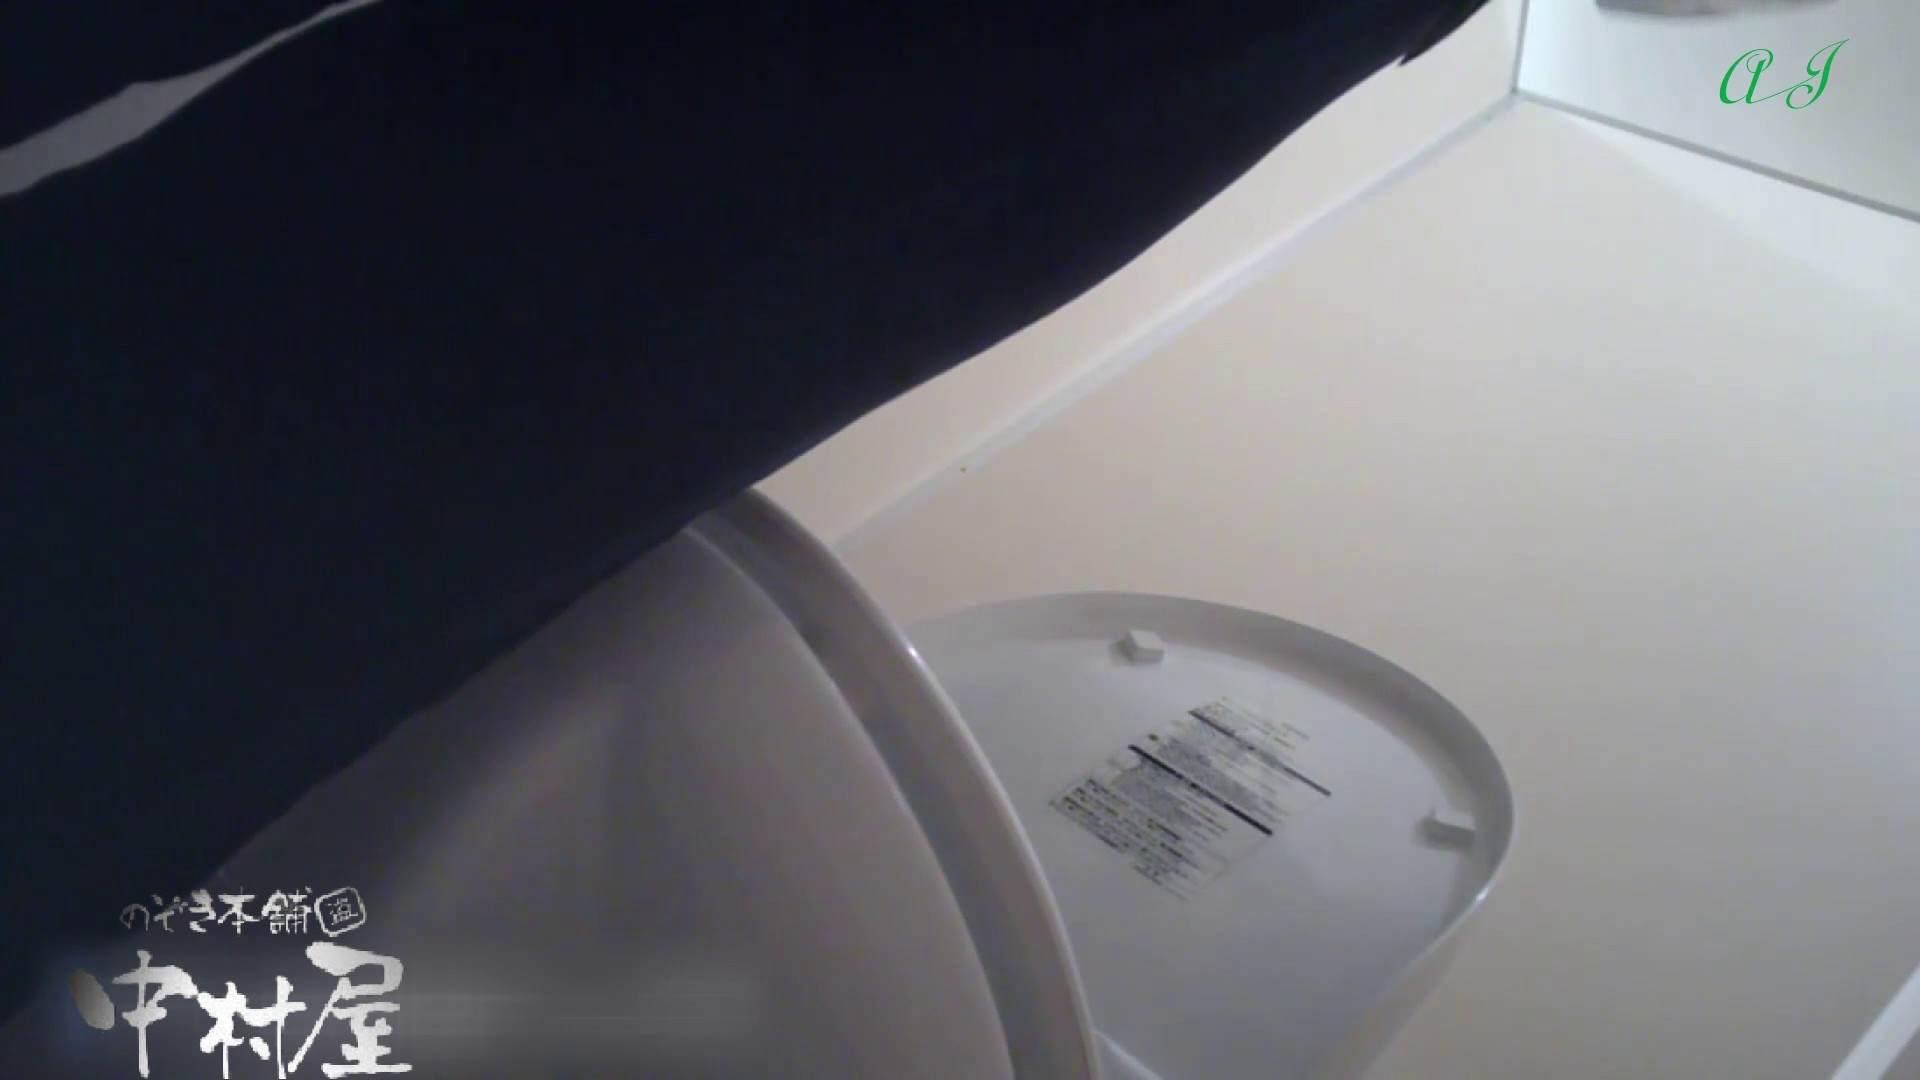 新アングル 4名の美女達 有名大学女性洗面所 vol.76 潜入 オマンコ無修正動画無料 10枚 2